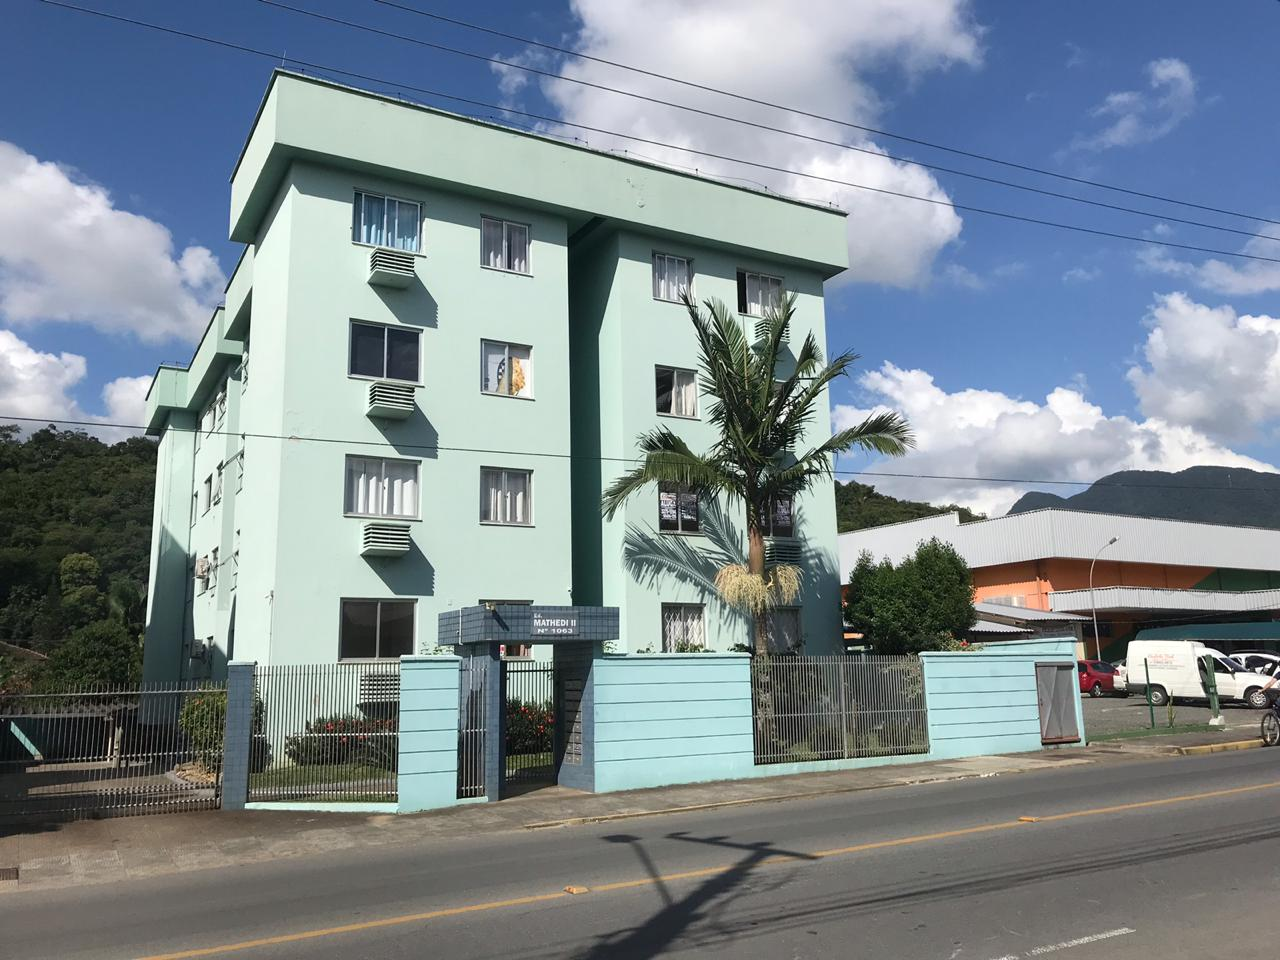 Código: 2884 Edifício Mathedi II – Nova Brasília – M.I nº 40.080